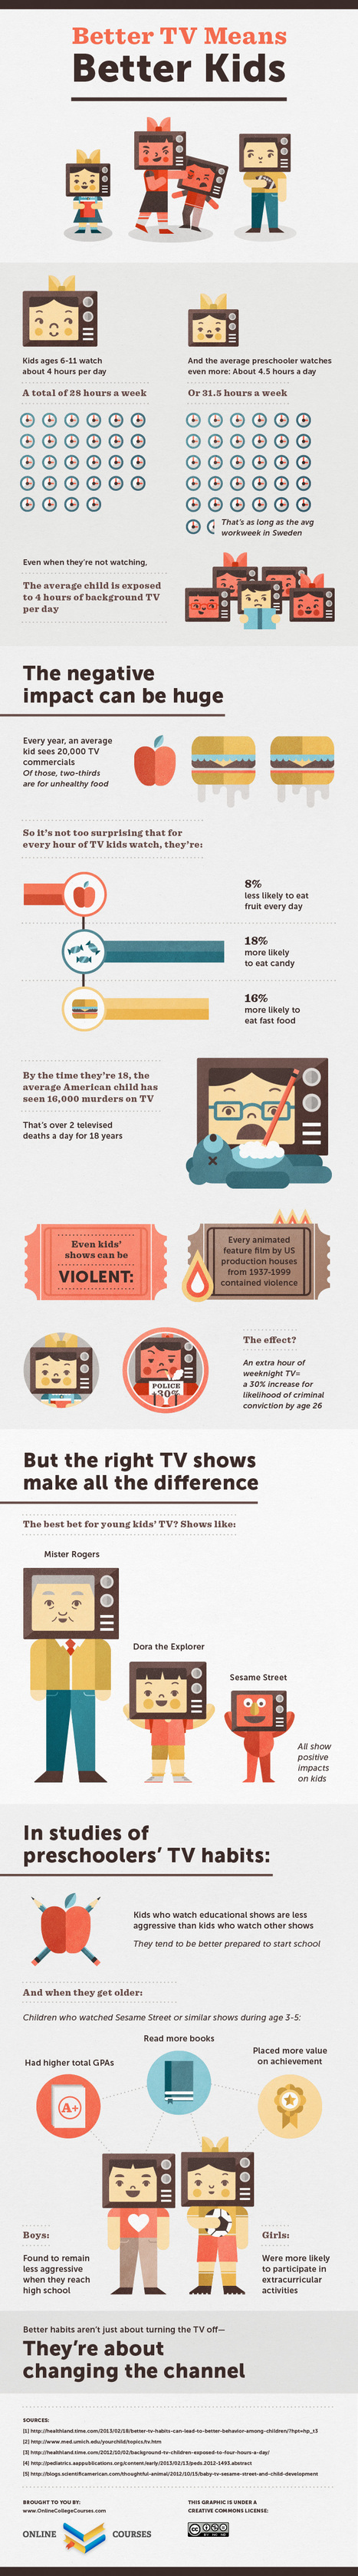 Good TV Habits Can Make Kids Smarter   Social Mercor   Scoop.it